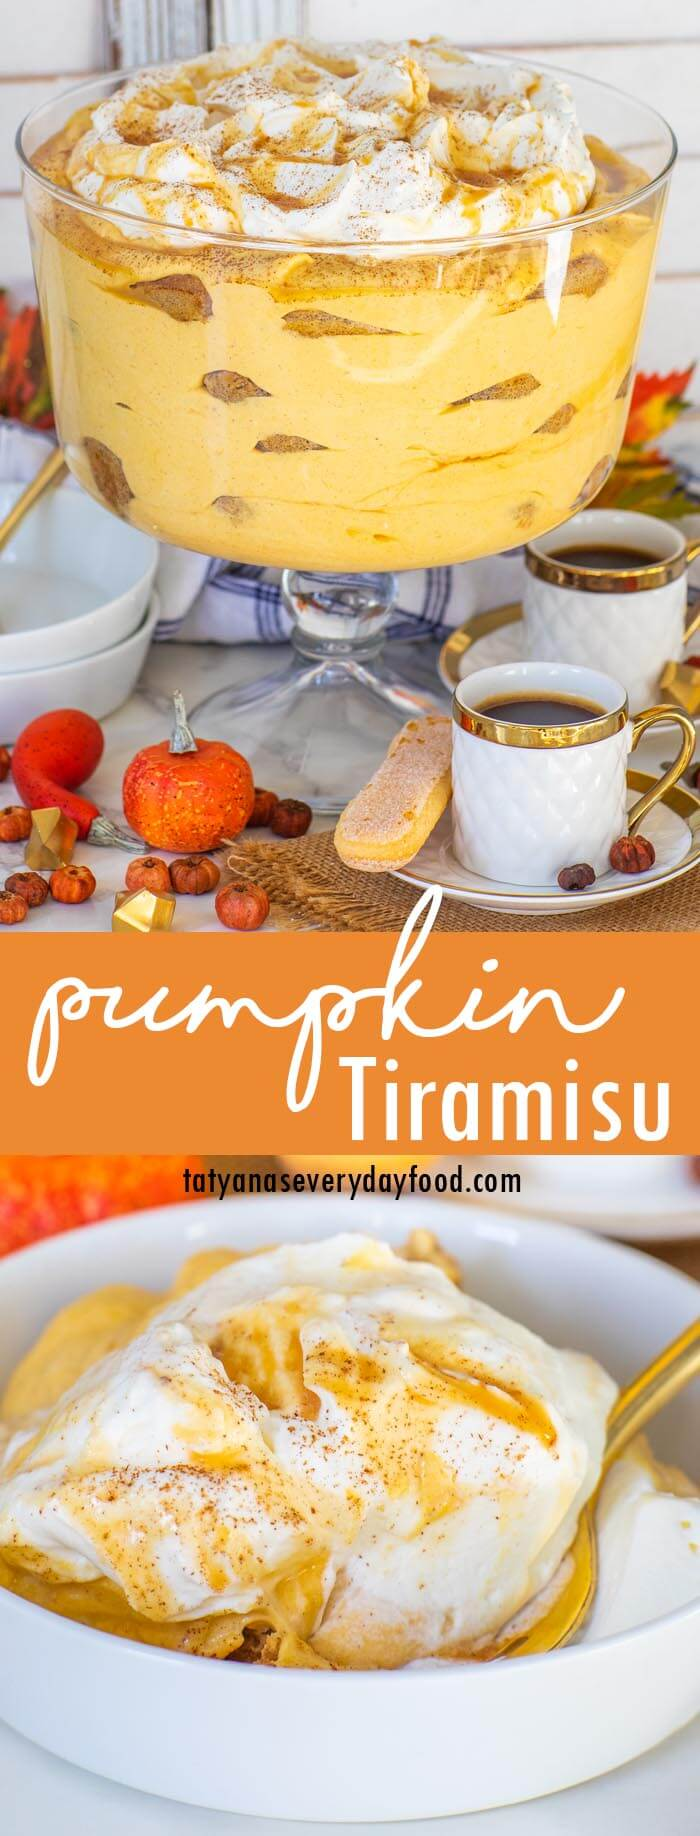 Pumpkin Tiramisu video recipe